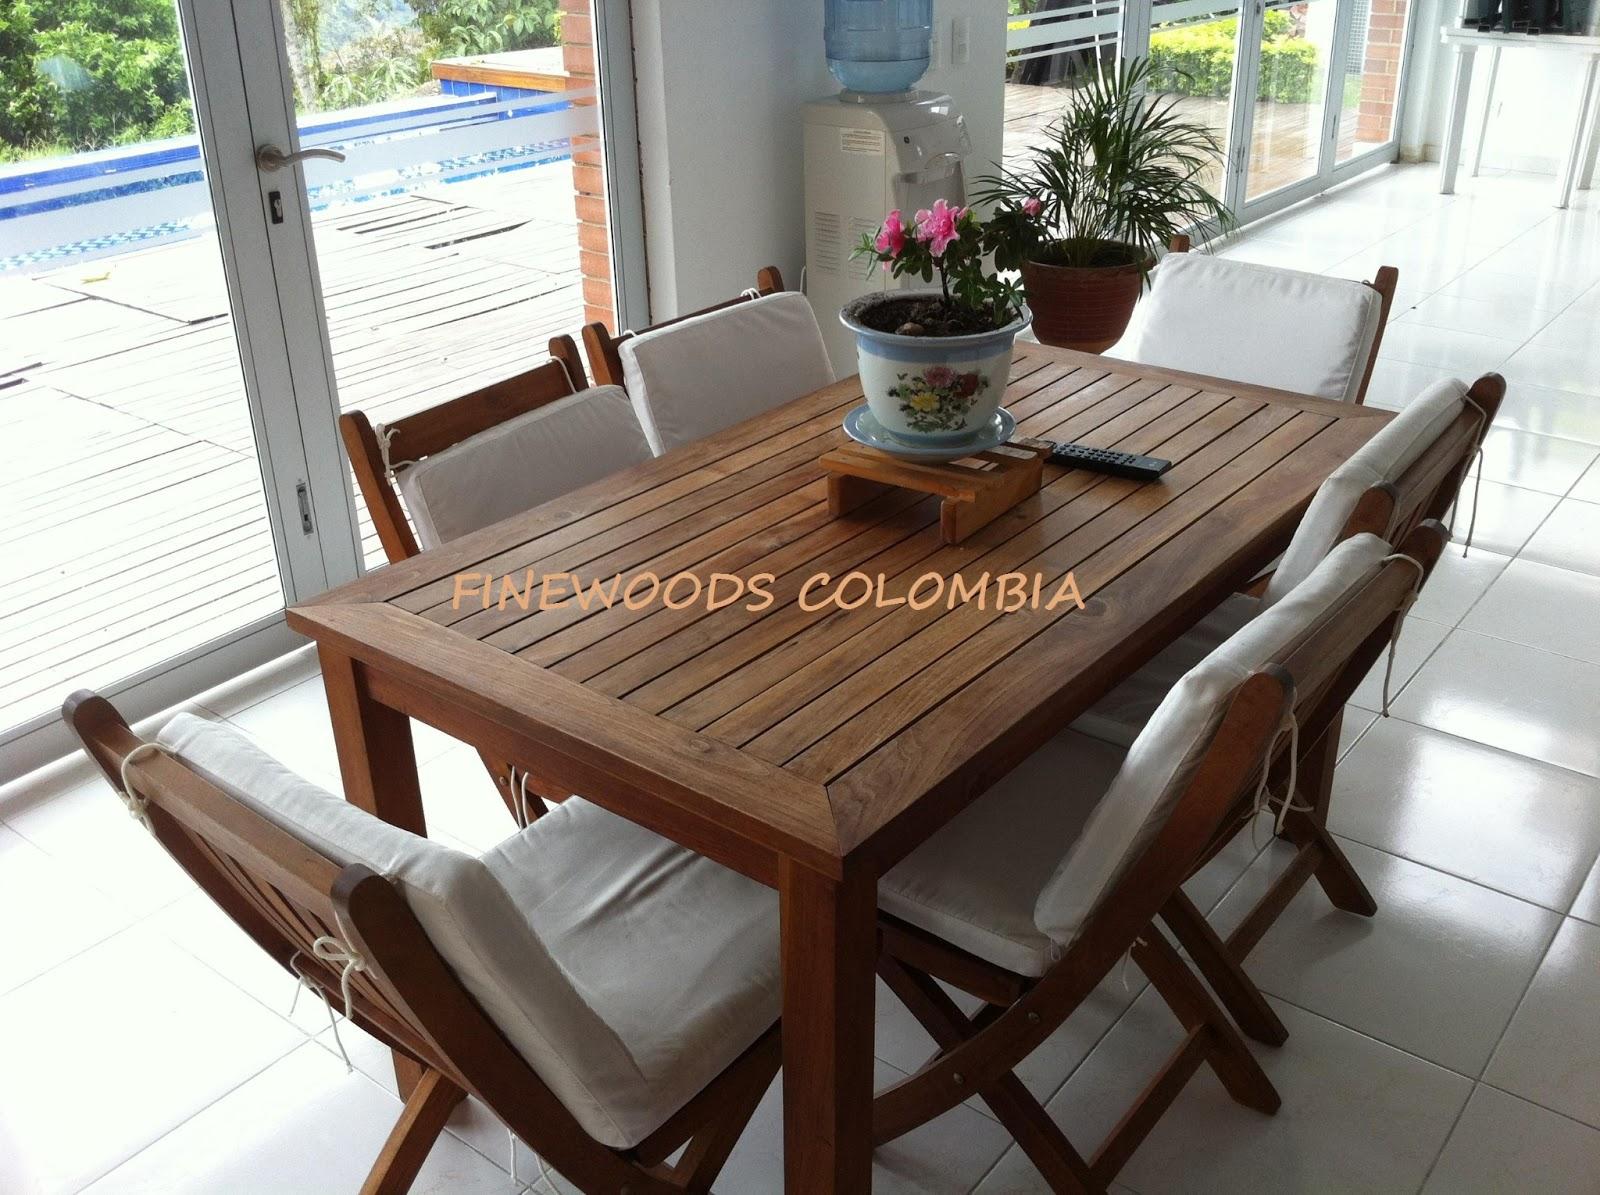 Finewoods Colombia Muebles Exterior # Muebles Teca Exterior